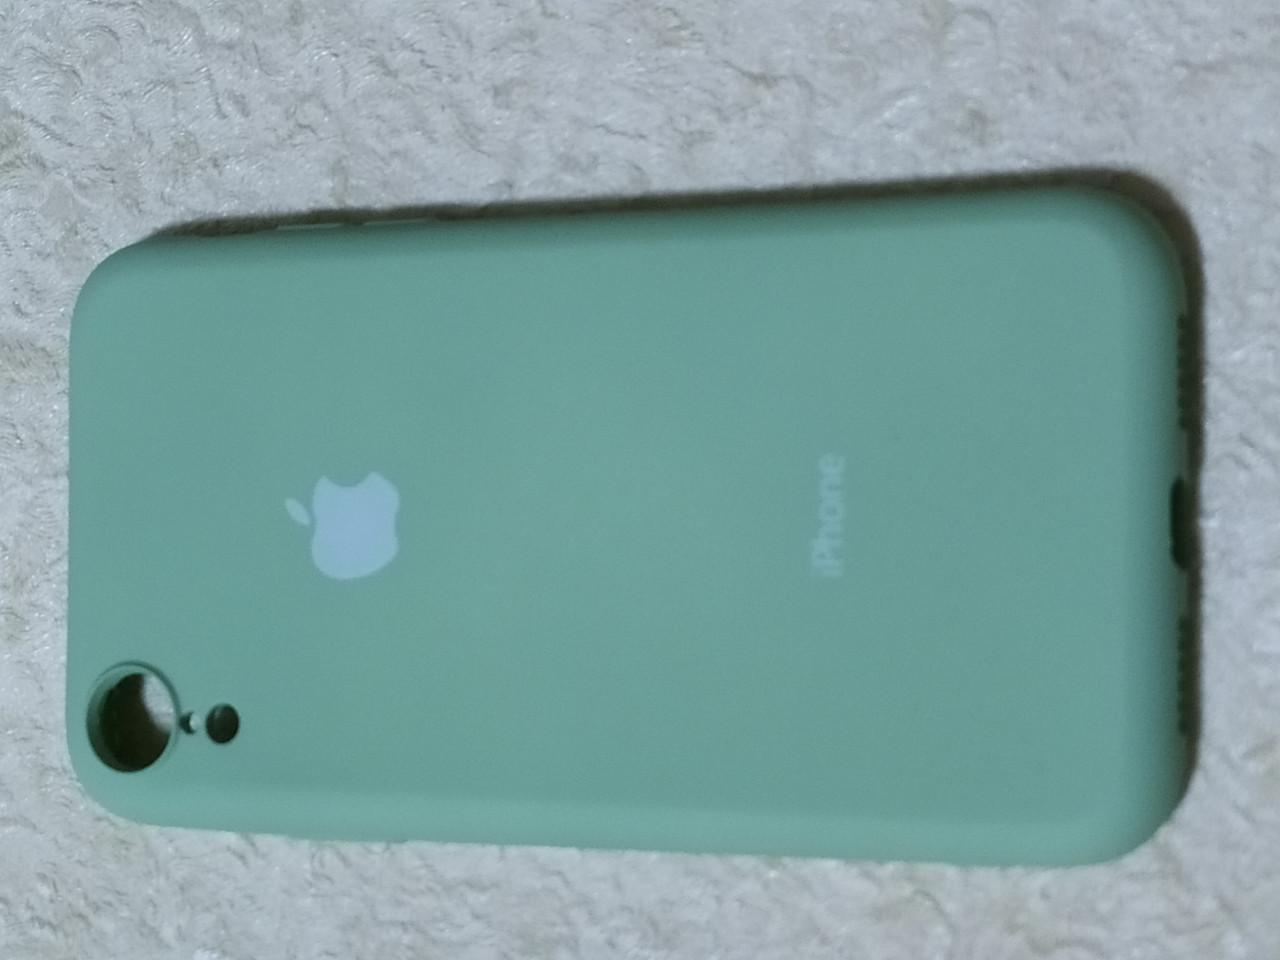 Накладка Silicon Cover full для iPhone XR 6.1 (м'ятний)